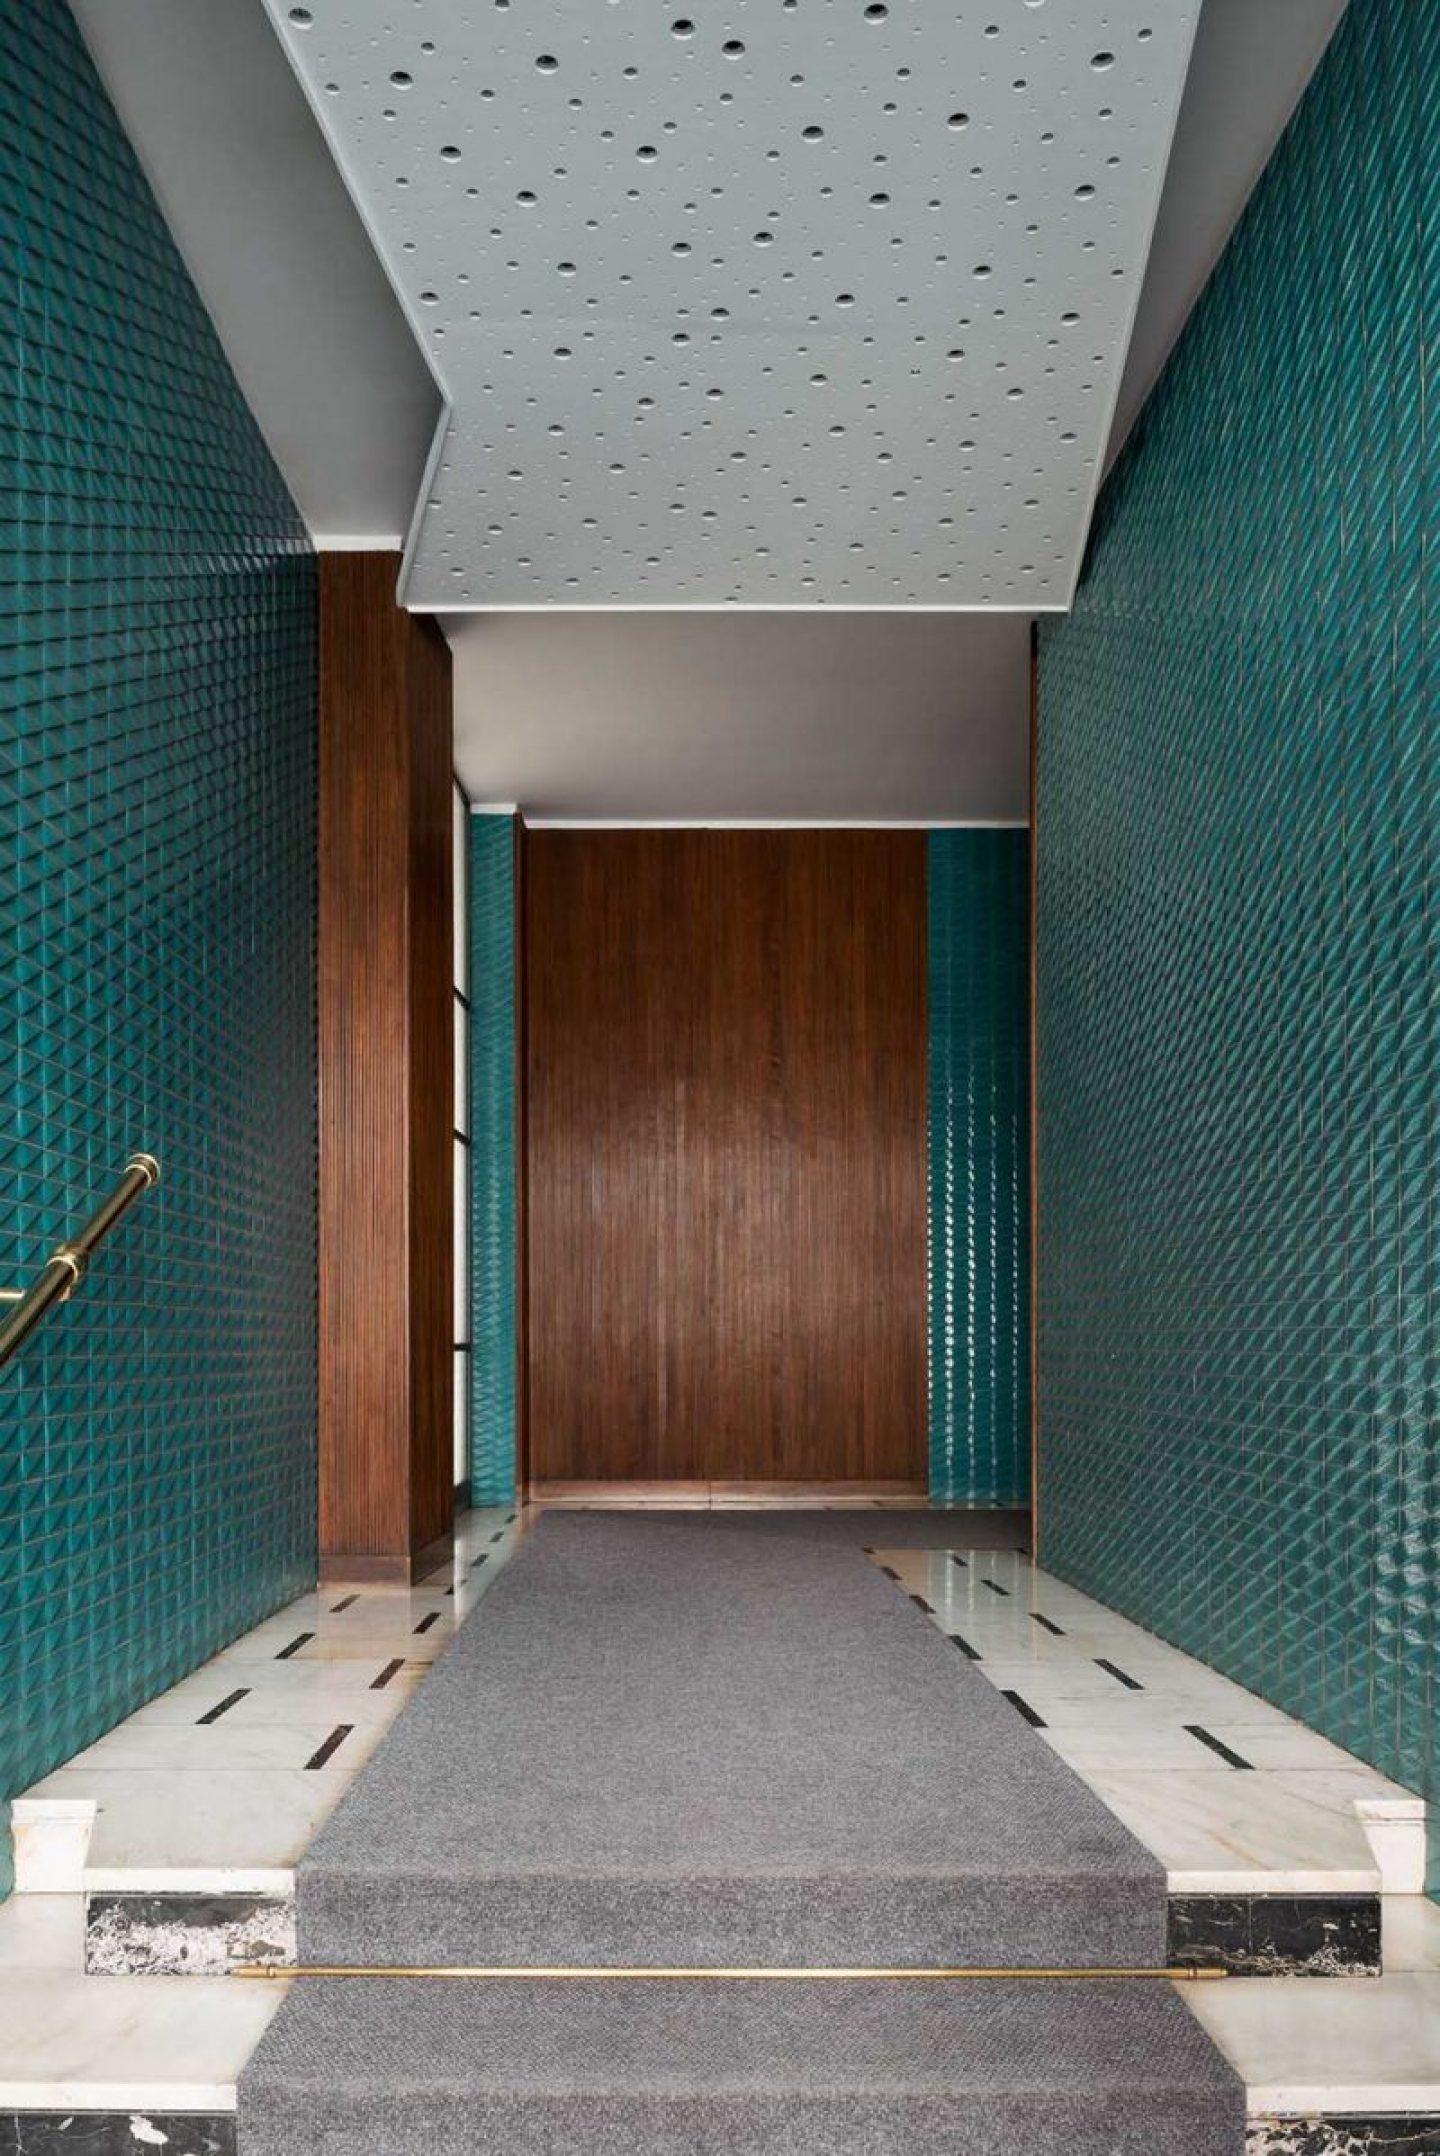 iGNANT_Architecture_Karl_Kolbitz_Taschen_Entryways_of_Milan_Ingressi_di_Milano_10